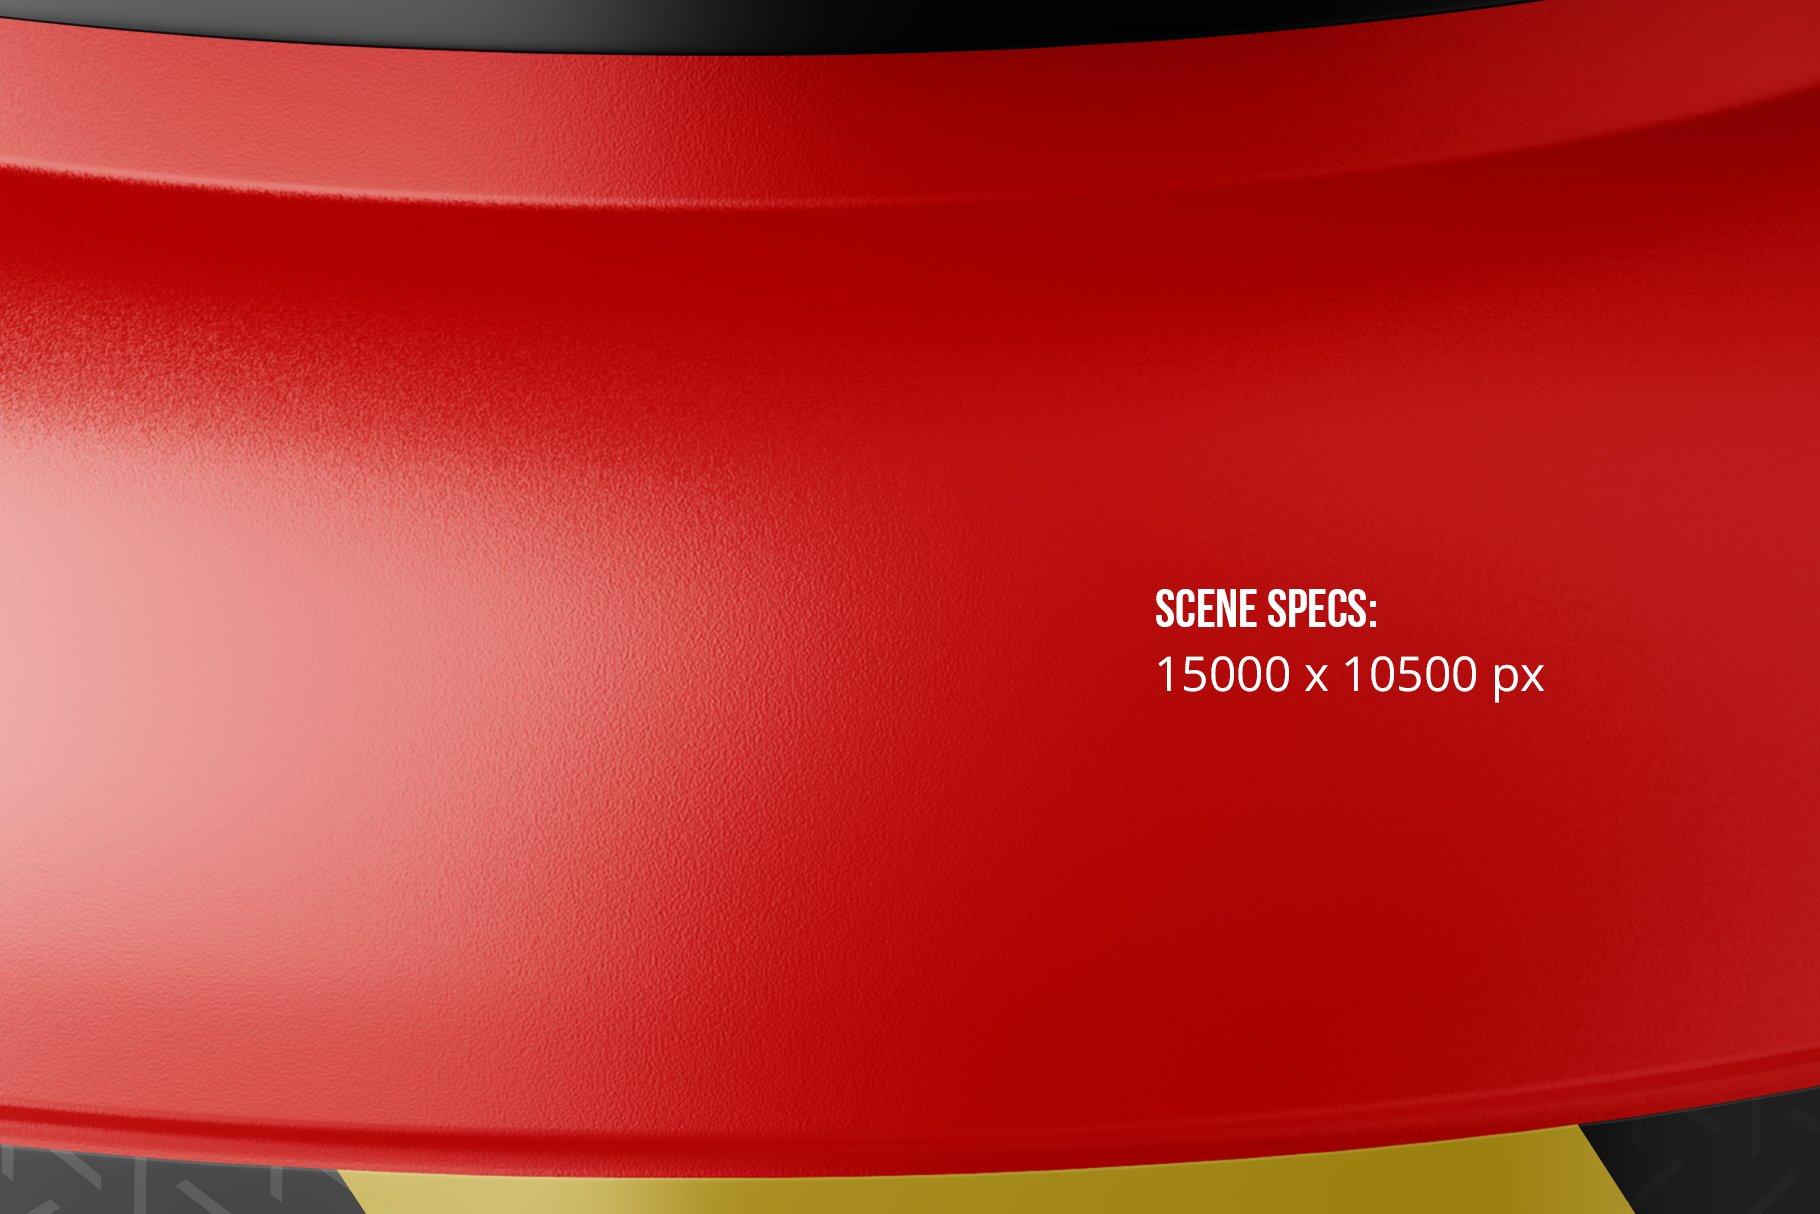 运动营养品果酱塑料罐标签设计展示样机模板 Sport Nutrition Plastic Jar Mockup插图2